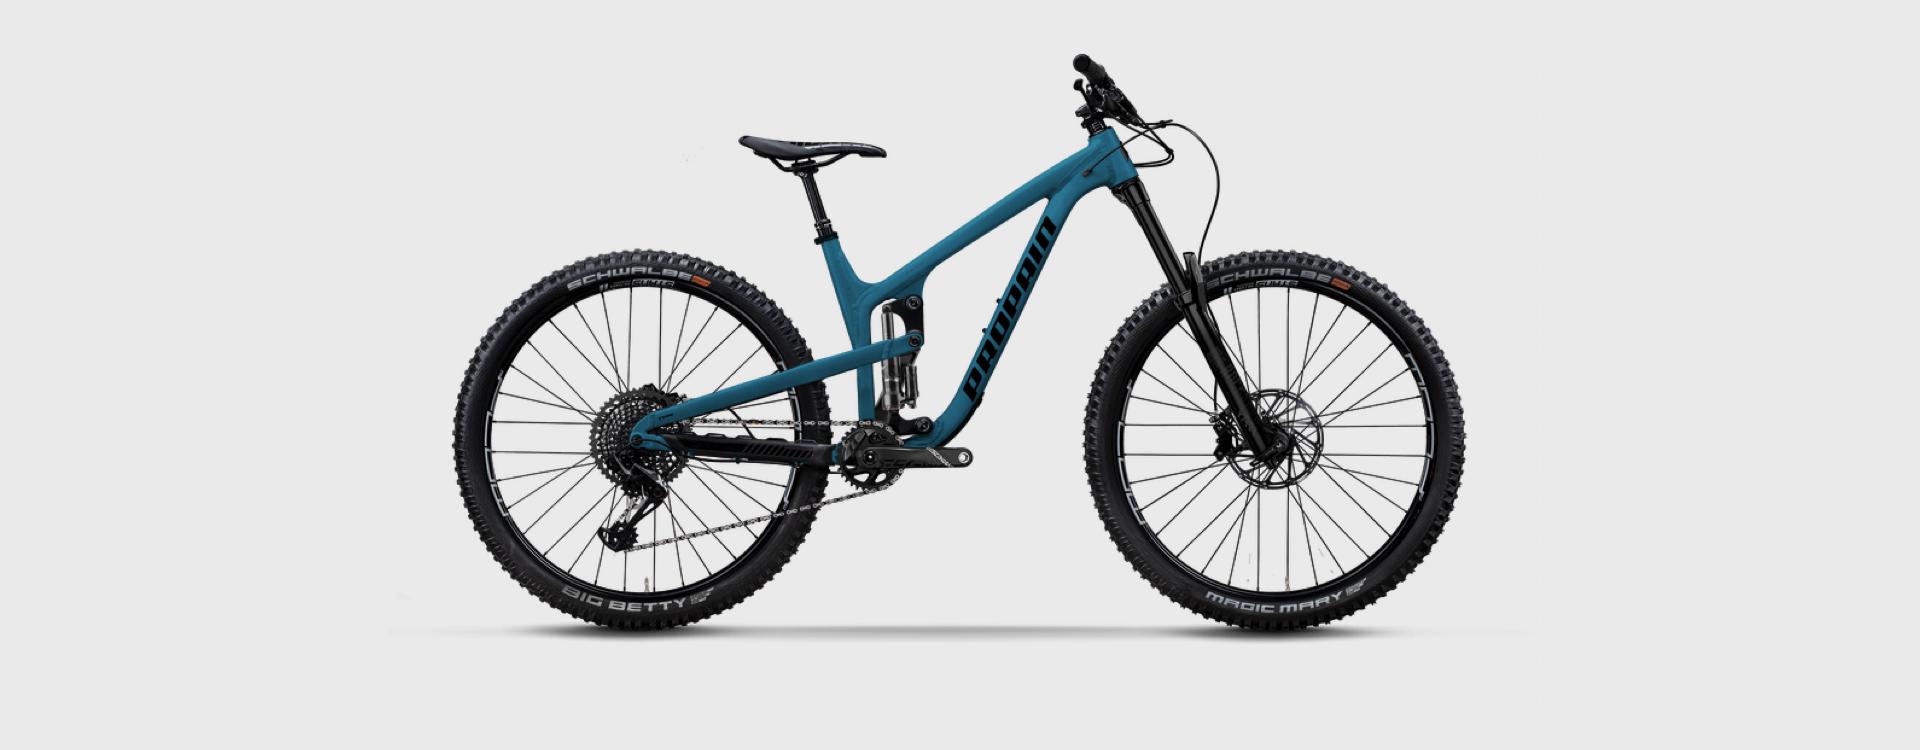 Bike Verleih Gummersbach Propain Bikes Testcenter NRW Tyee 3 - AL - M - Mix - Petrol - 1920x750